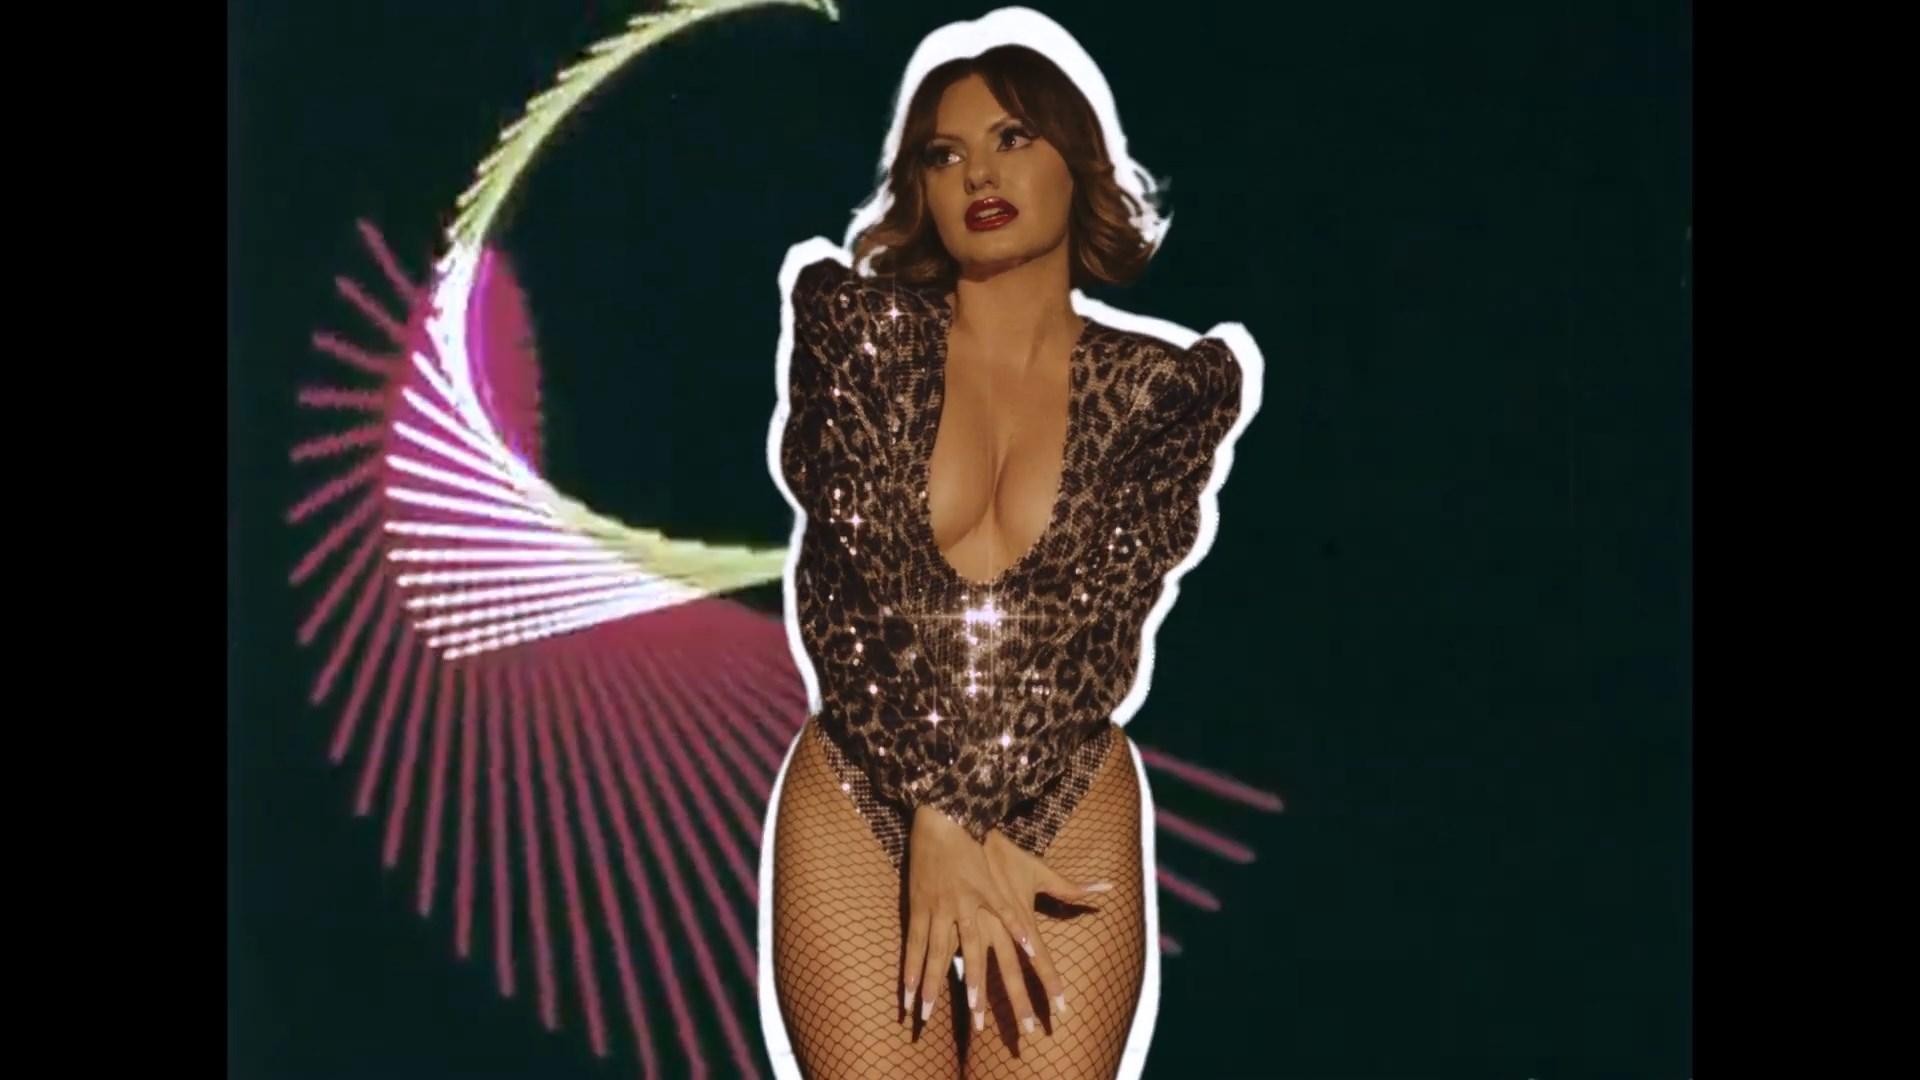 Alexandra Stan x NERVO - Come Into My World   Official Video.mp4_snapshot_01.29_[2021.07.03_03.03.00].jpg